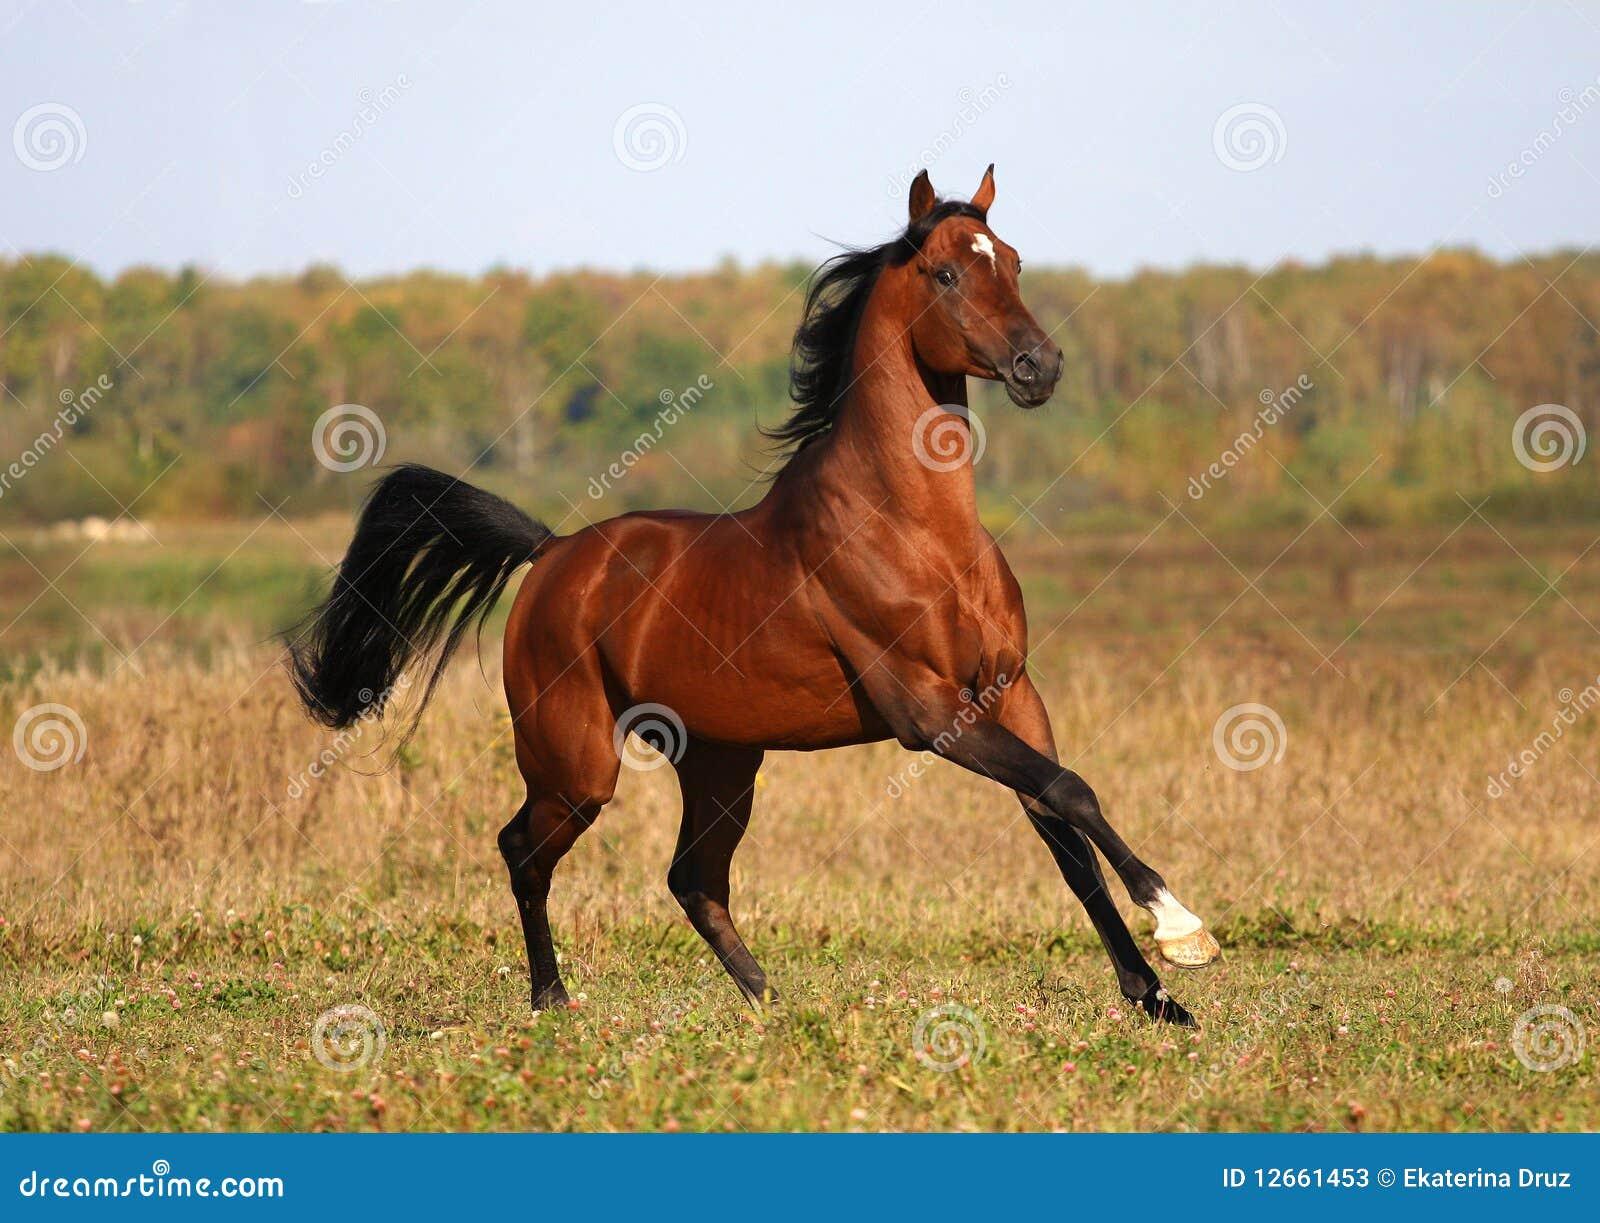 Bay Arabian Horse Running Stock Image Image Of Attentive